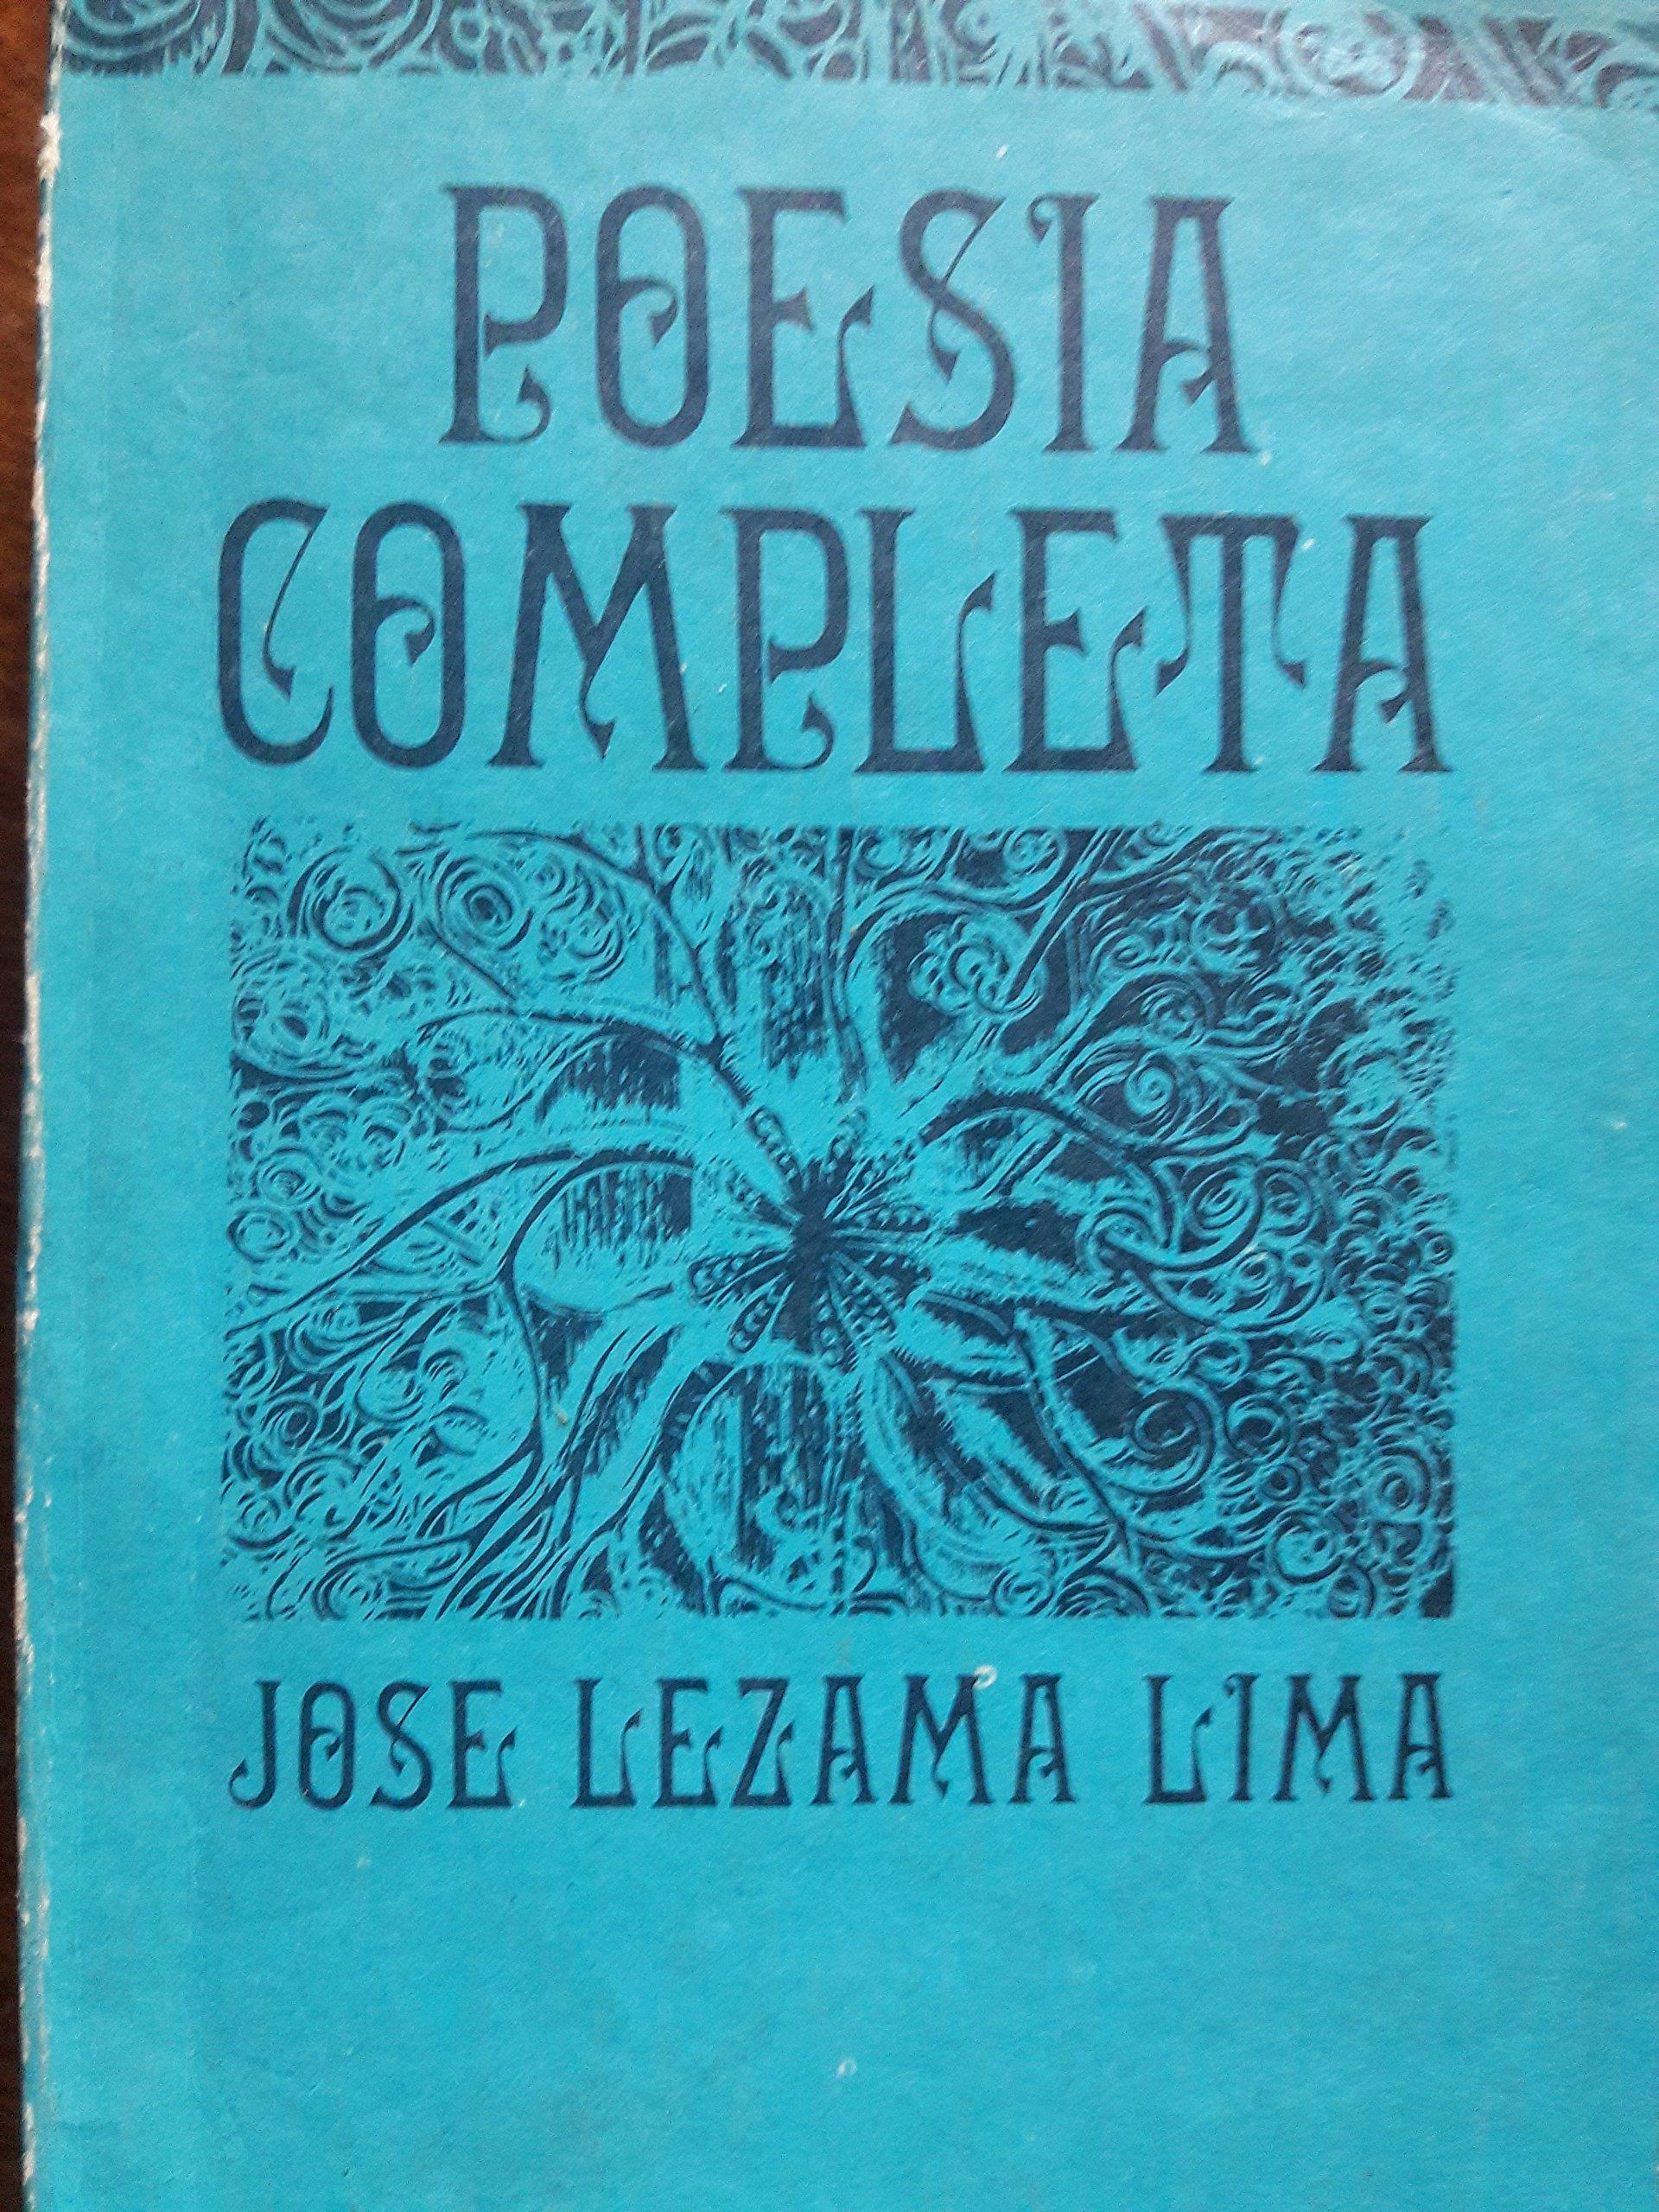 Poesia completa, de jose lezama lima, habana, cuba, 1985.: Amazon.com: Books